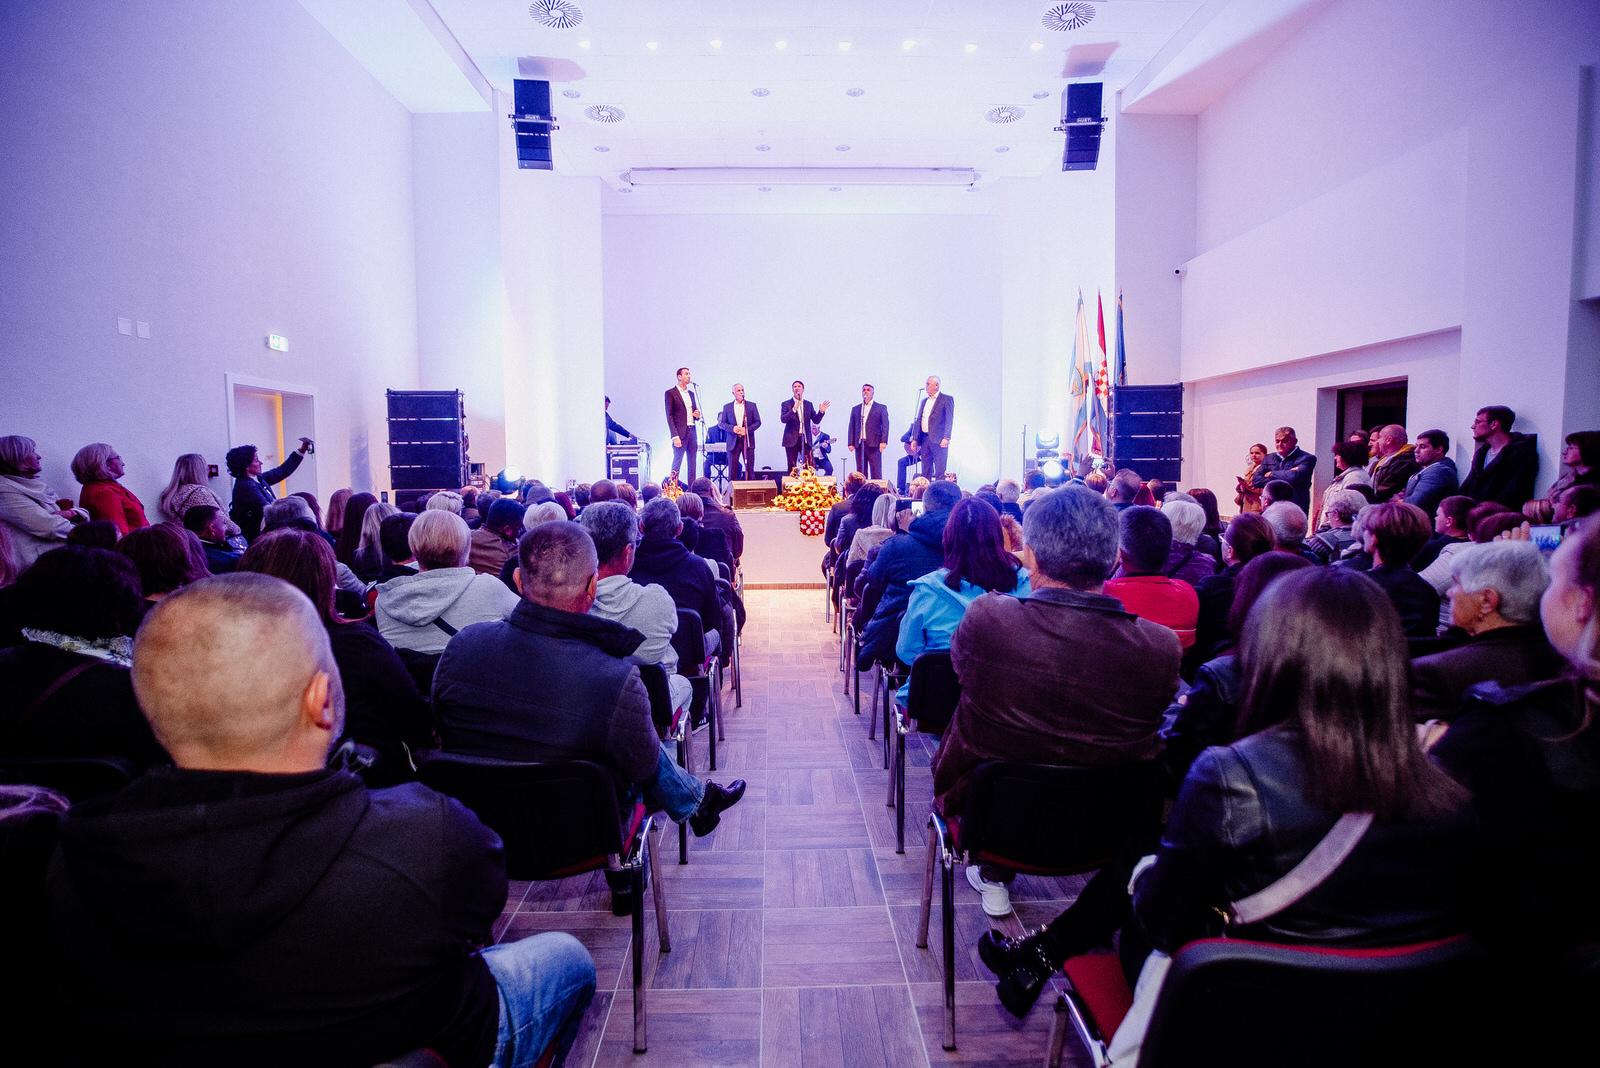 likaclub_korenica_klapa-intrade_dan-neovisnosti_2019-8